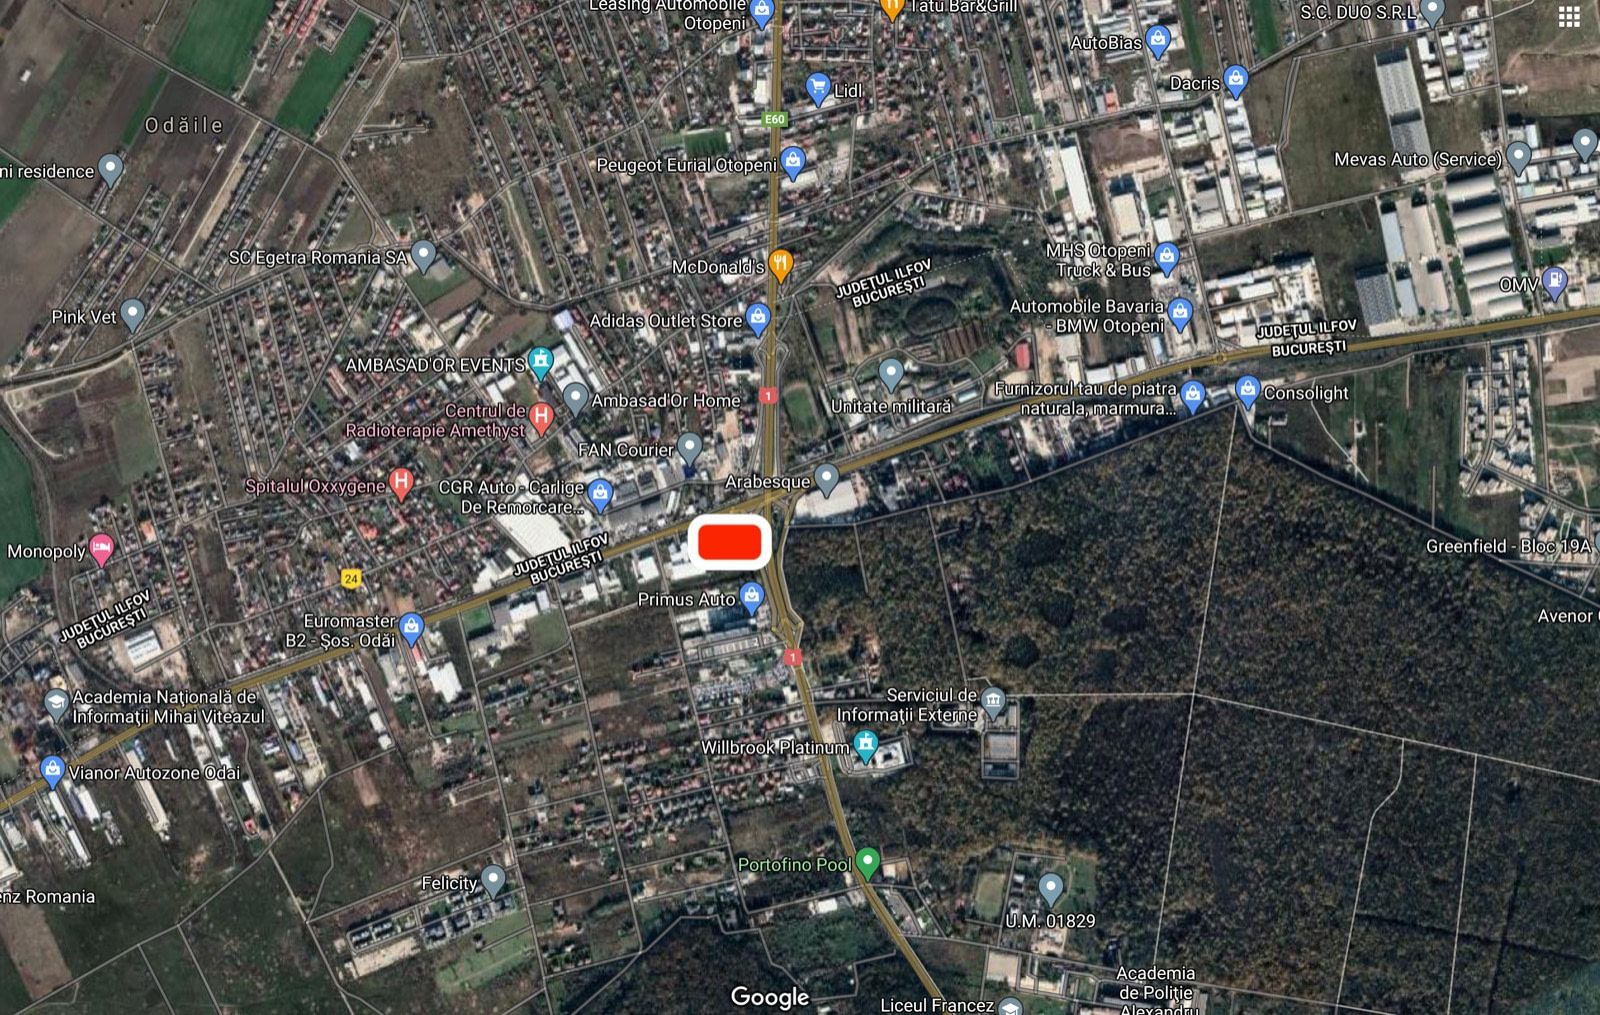 Teren | Baneasa | Centura | Comercial | DN1 | Bucuresti | Otopeni